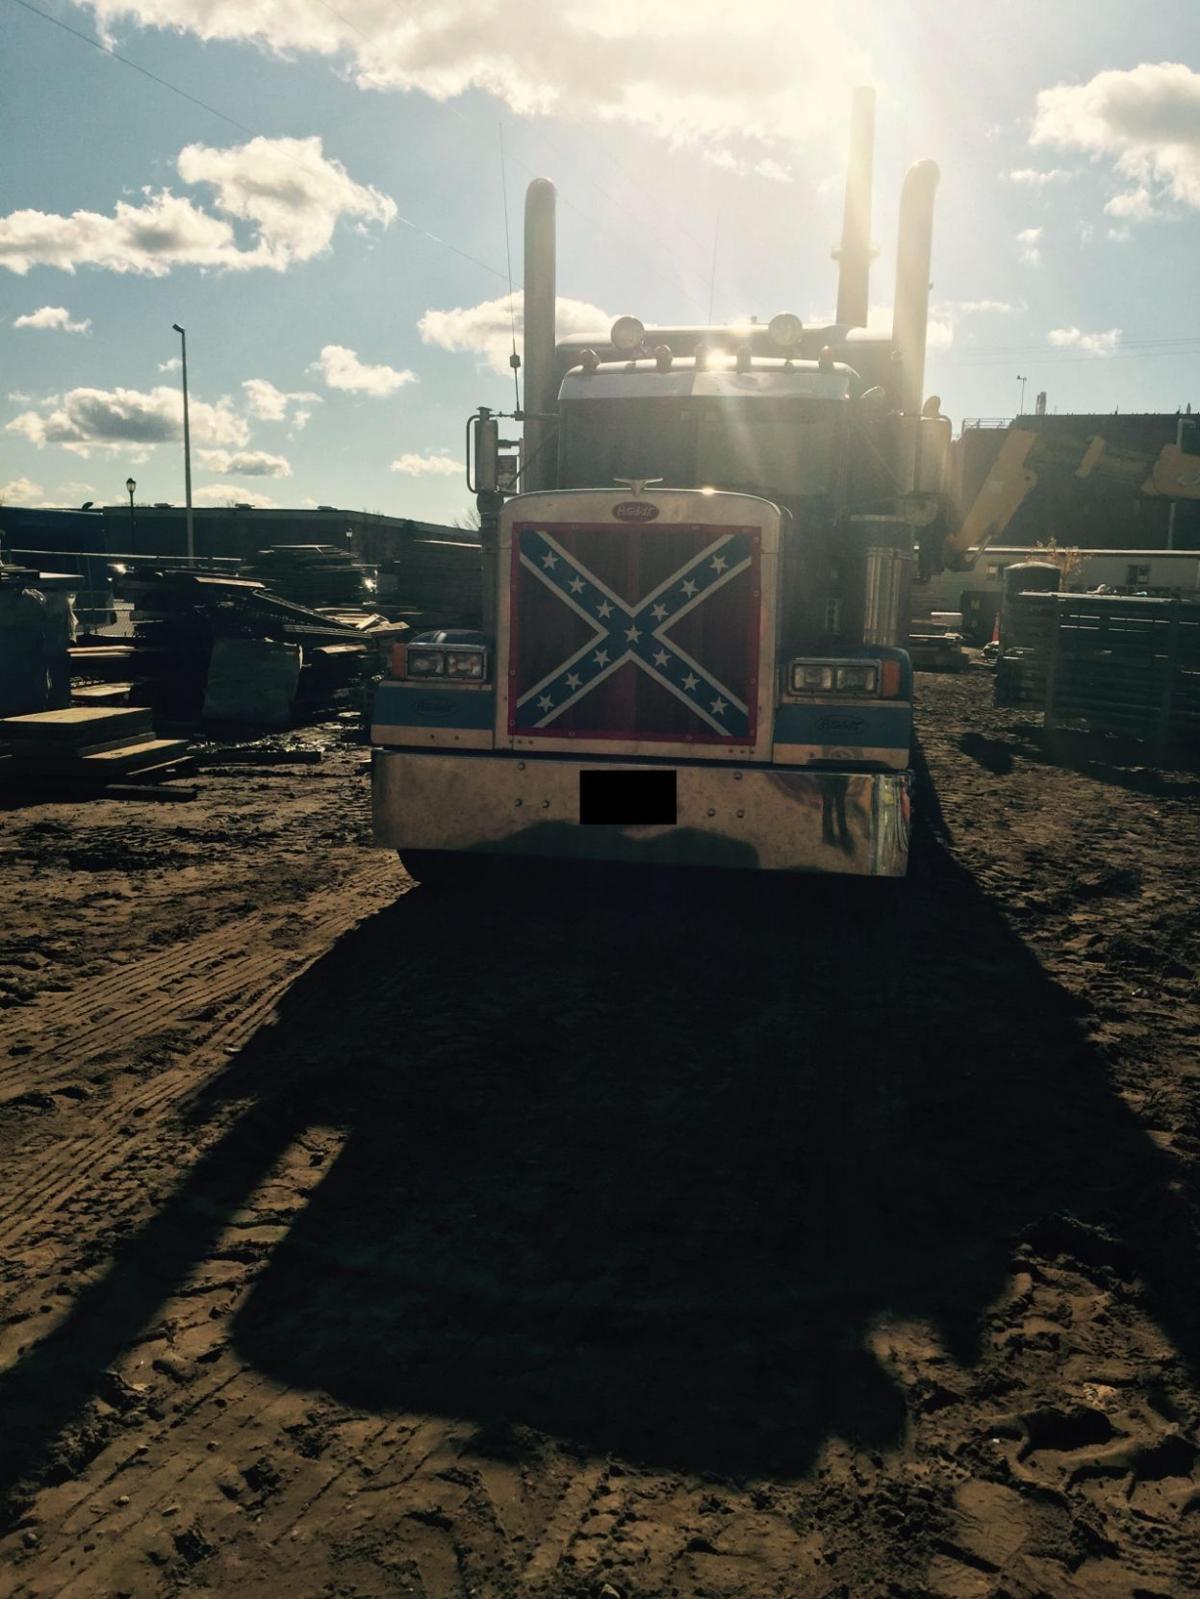 Confederate flag truck